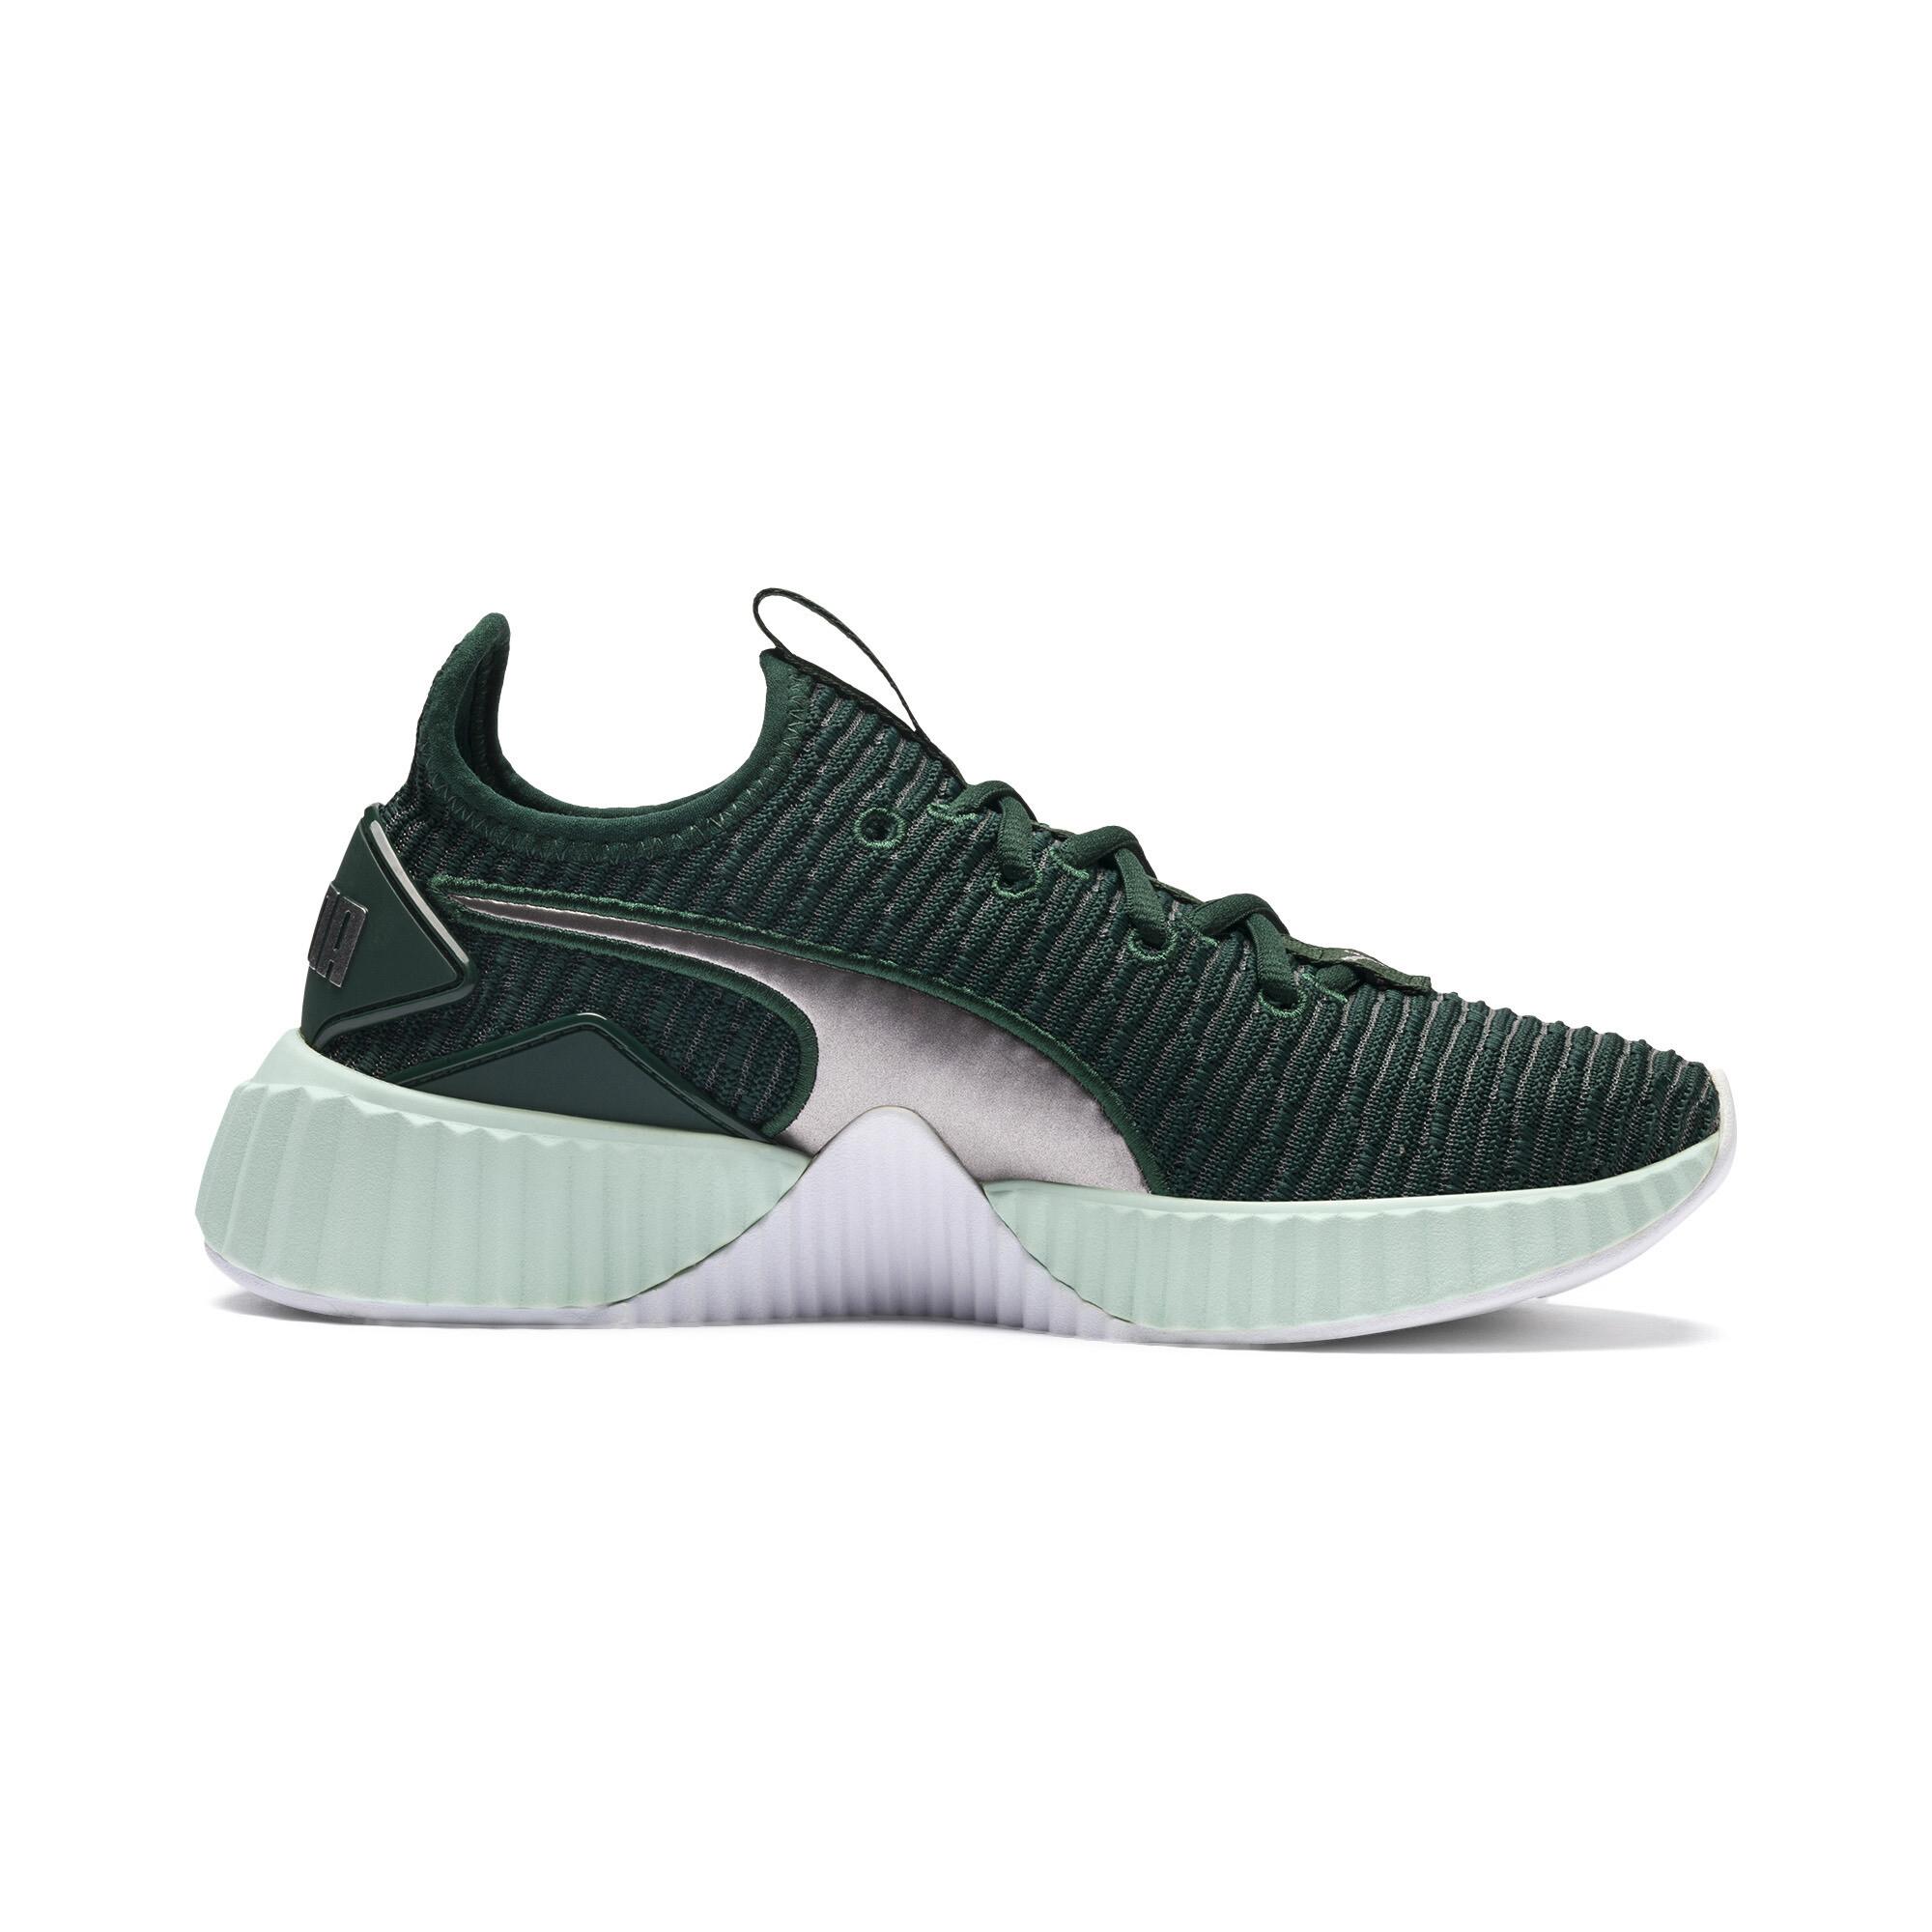 Image Puma Defy Trailblazer Women's Sneakers #6